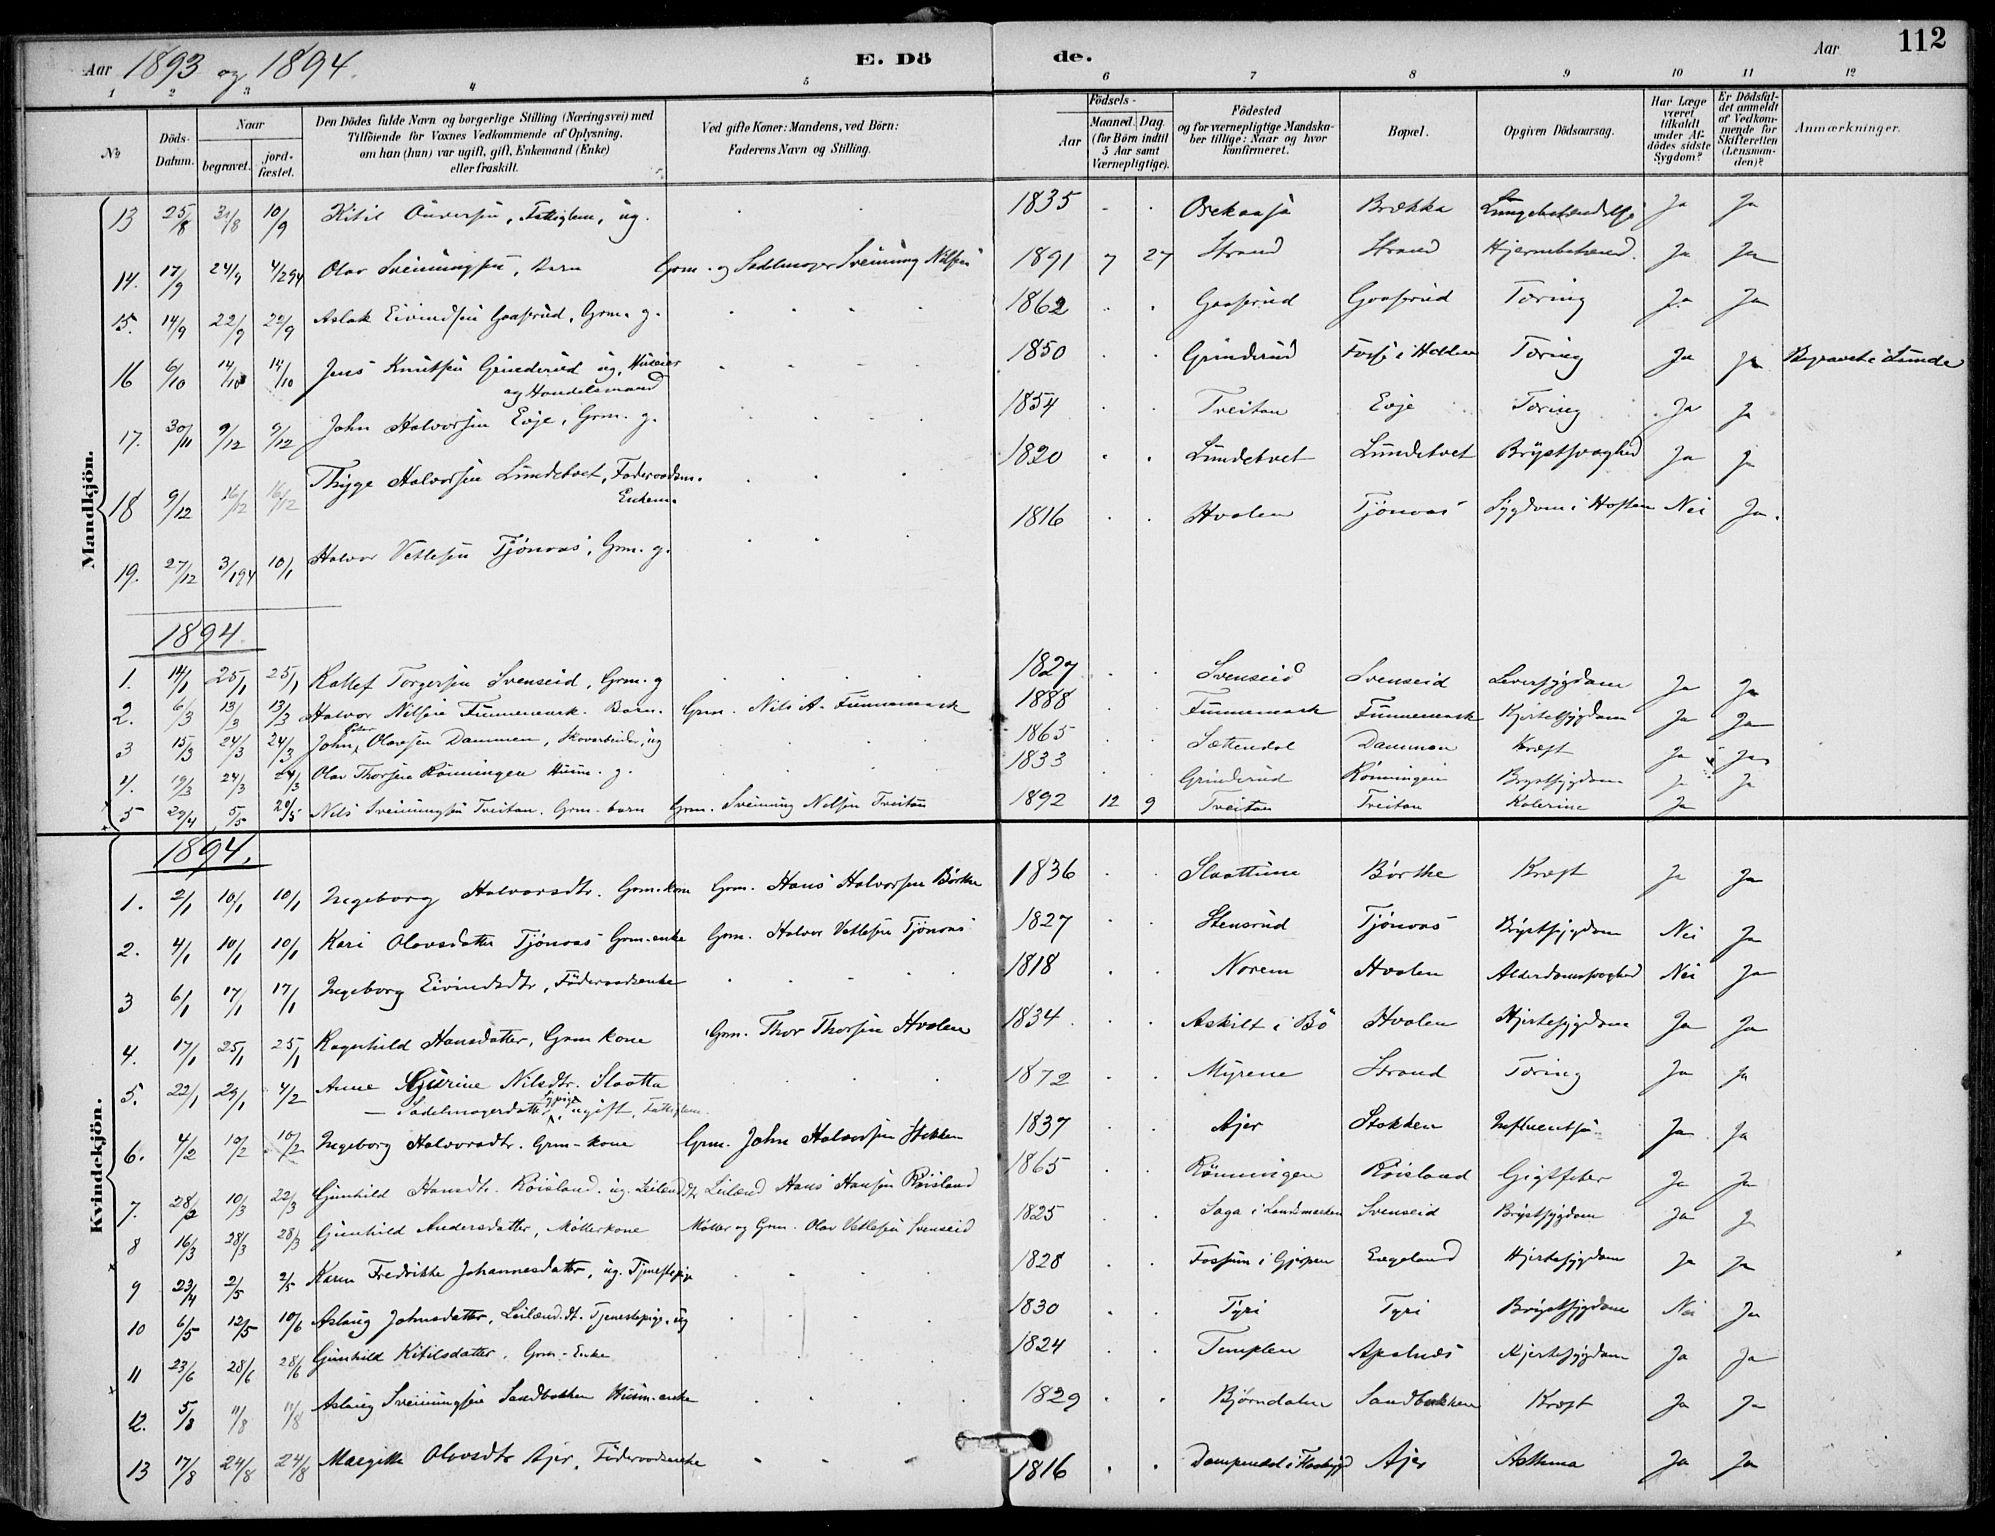 SAKO, Lunde kirkebøker, F/Fa/L0003: Ministerialbok nr. I 3, 1893-1902, s. 112